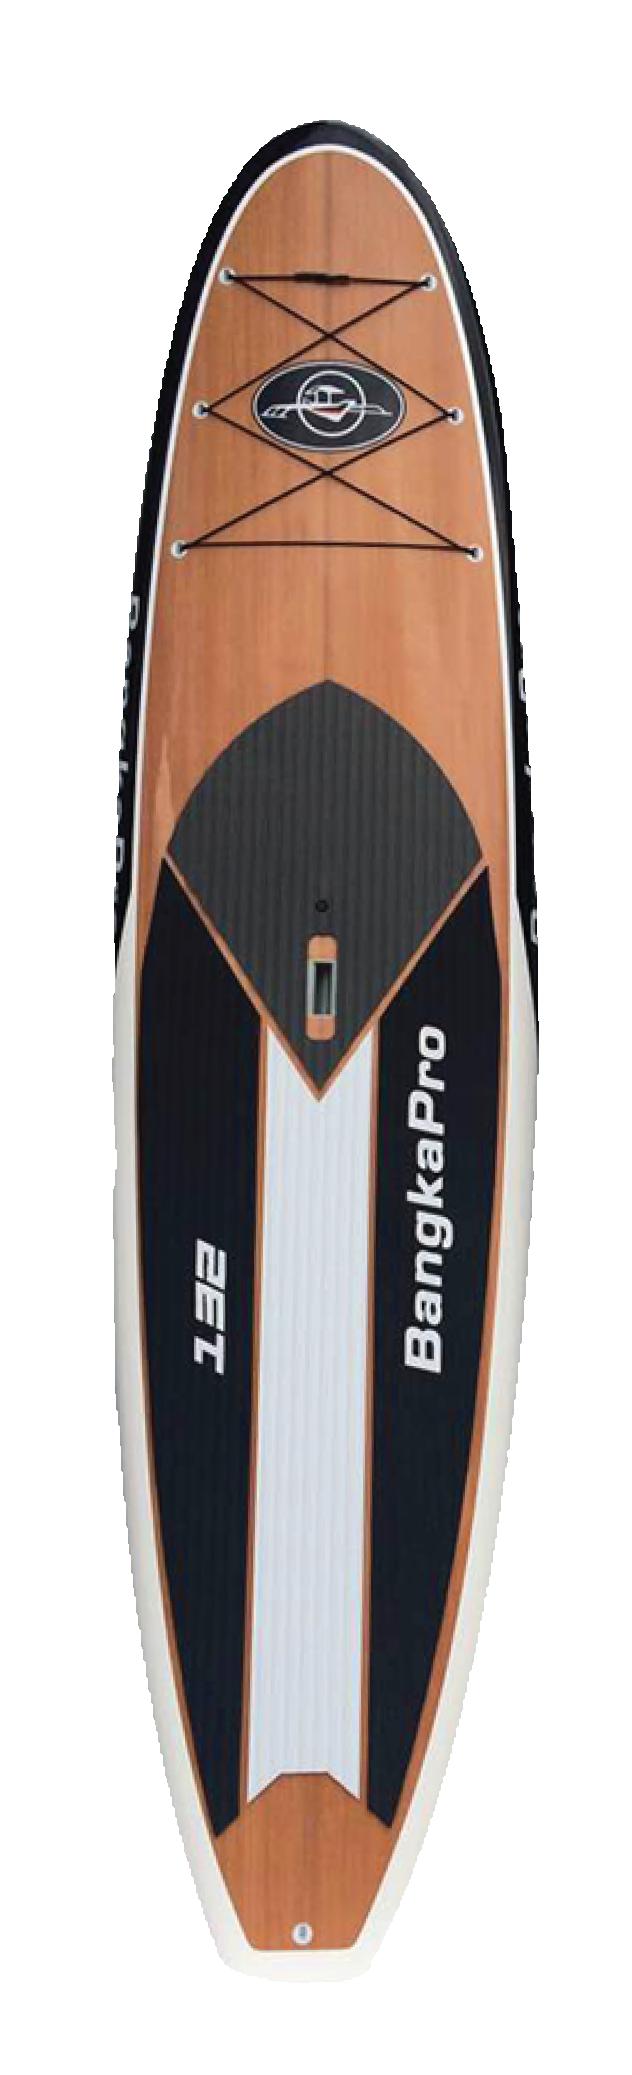 SUP Fiberglass Surf